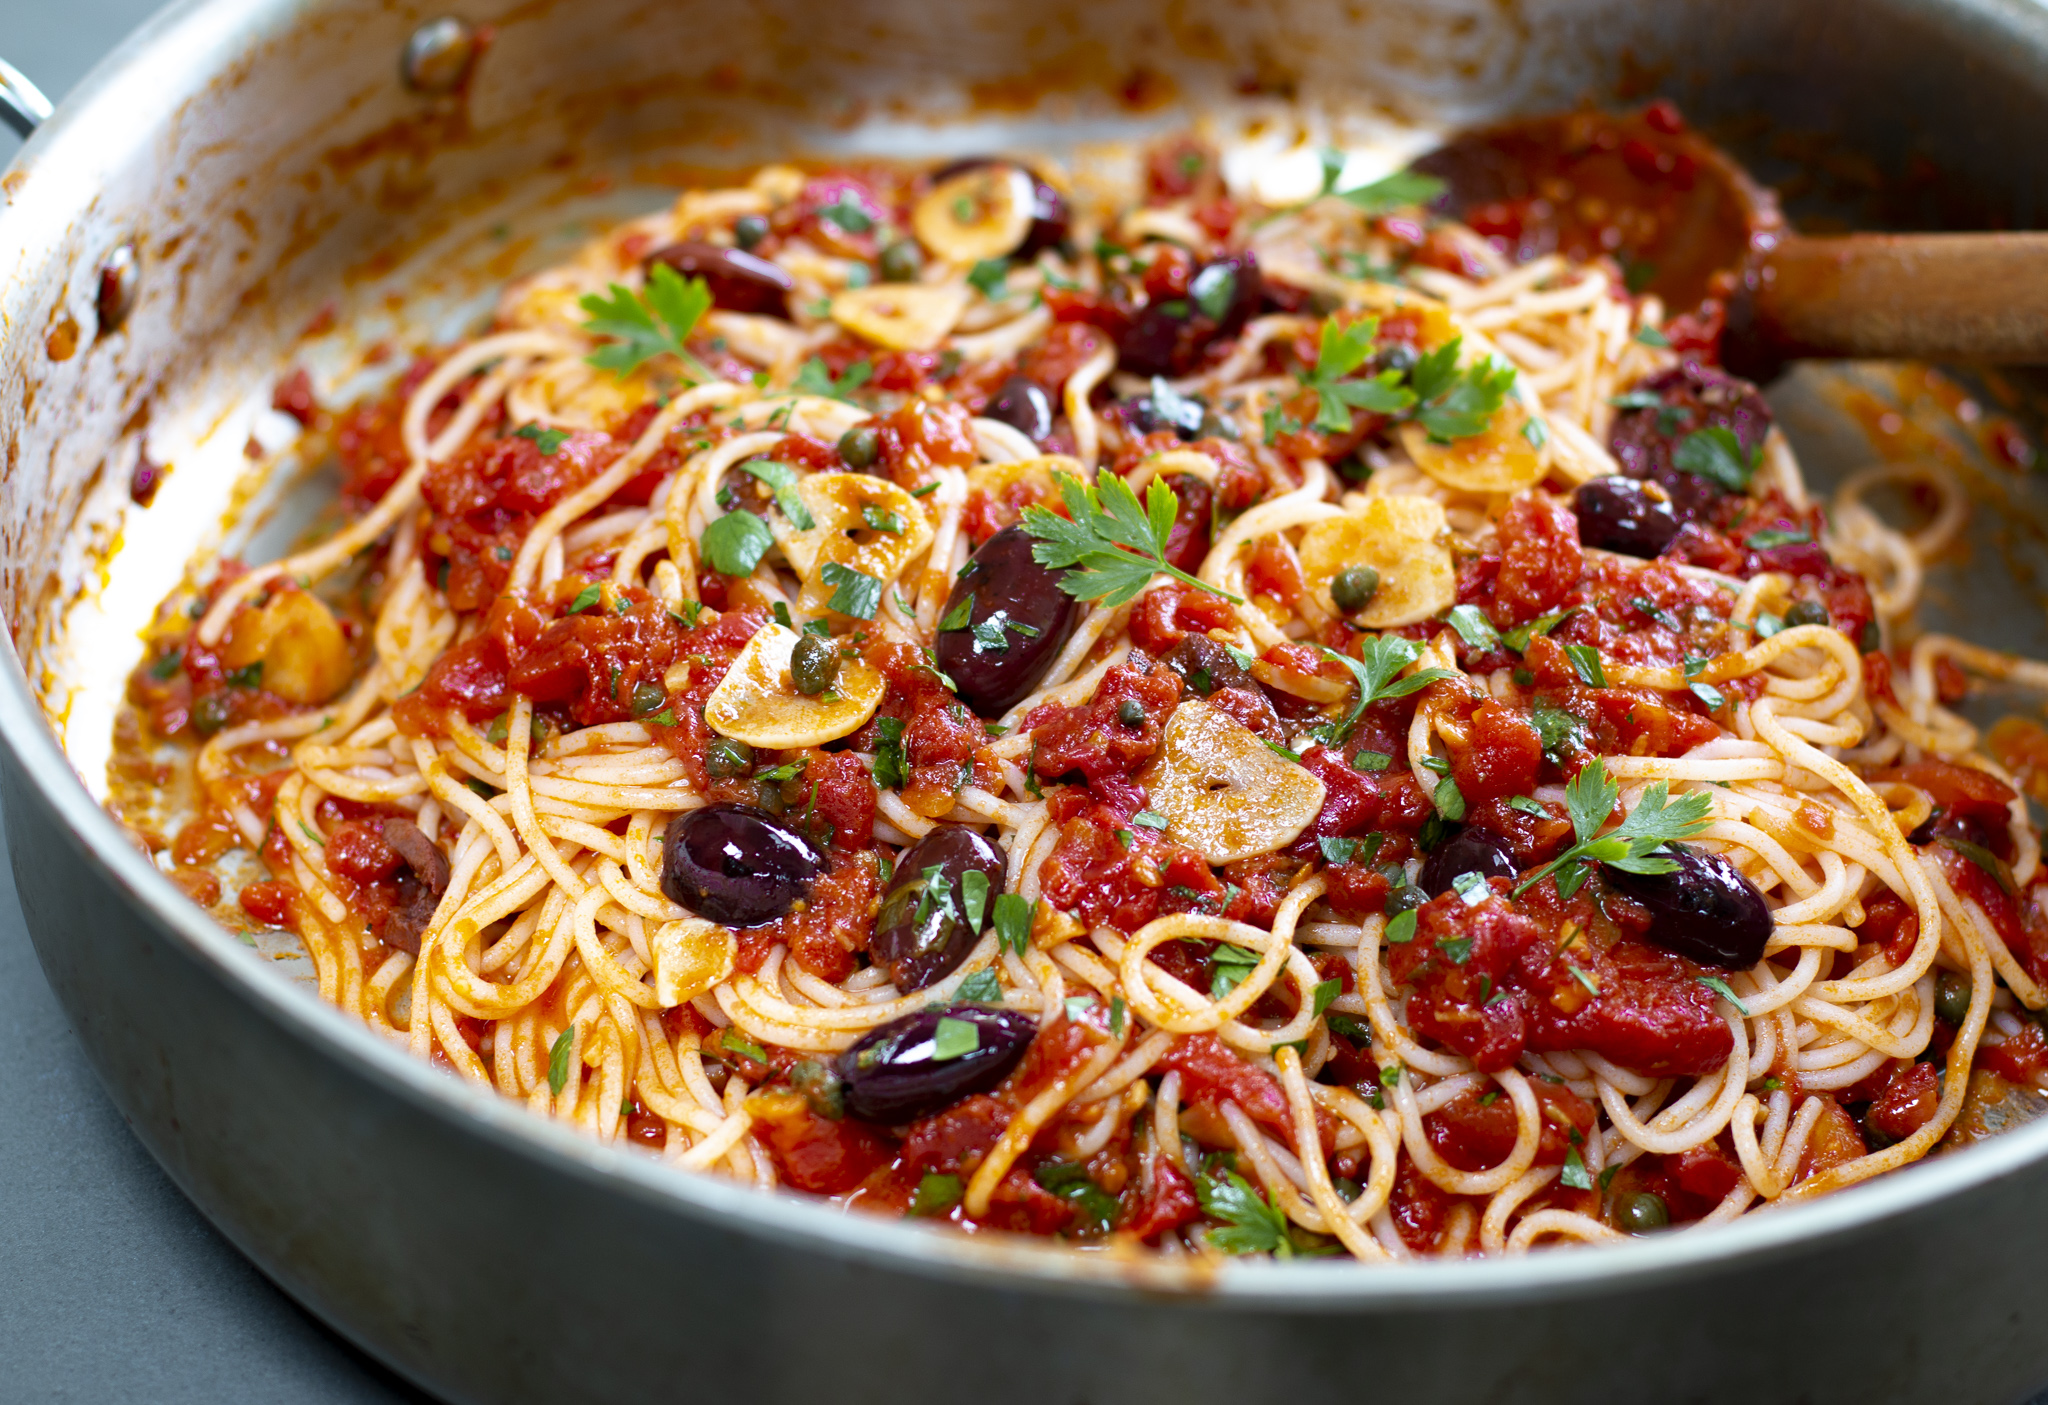 Karen's Pasta Puttanesca with Fresh Tomatoes